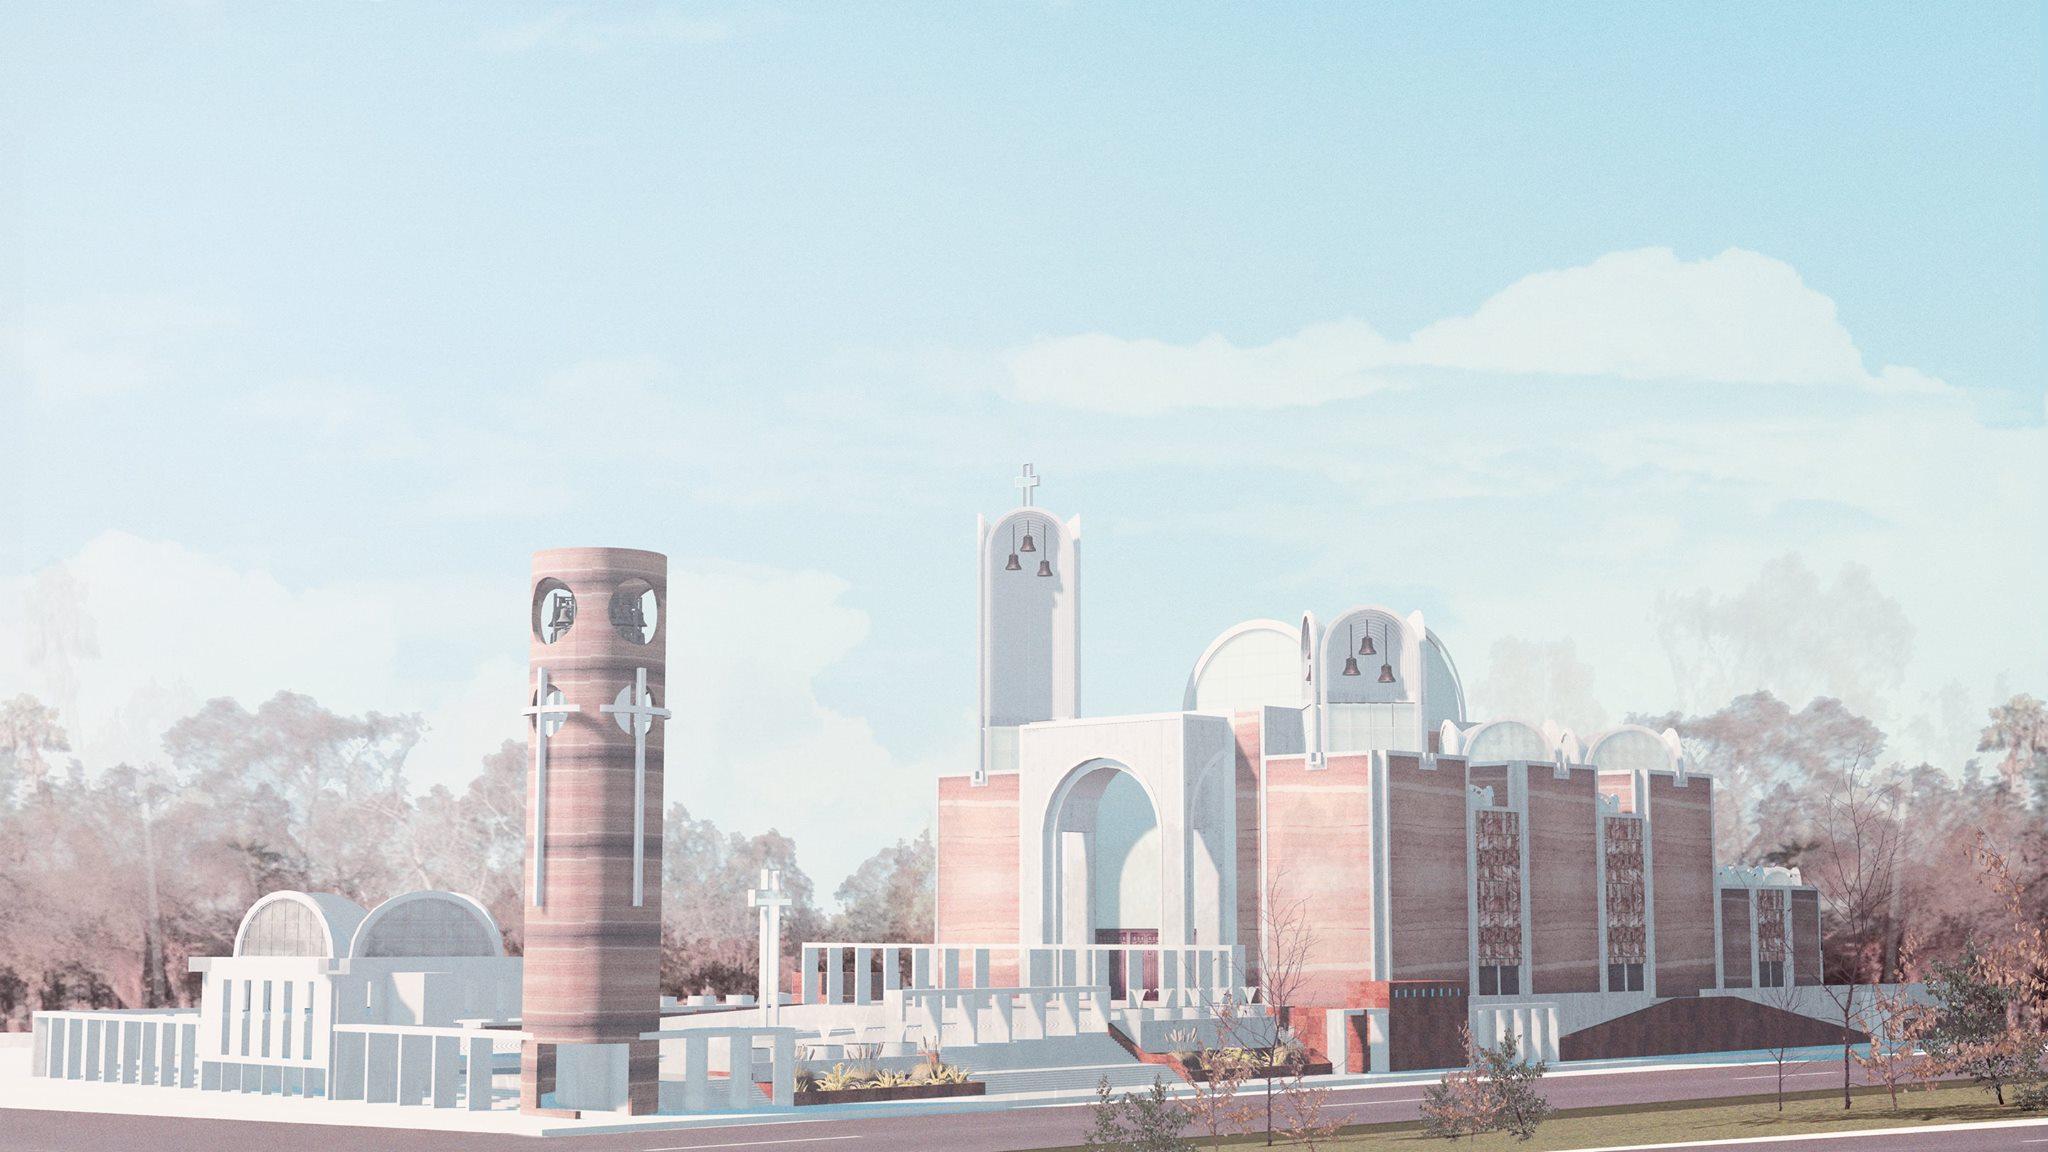 Presentan anteproyecto de la Nueva Catedral Metropolitana de Tijuana